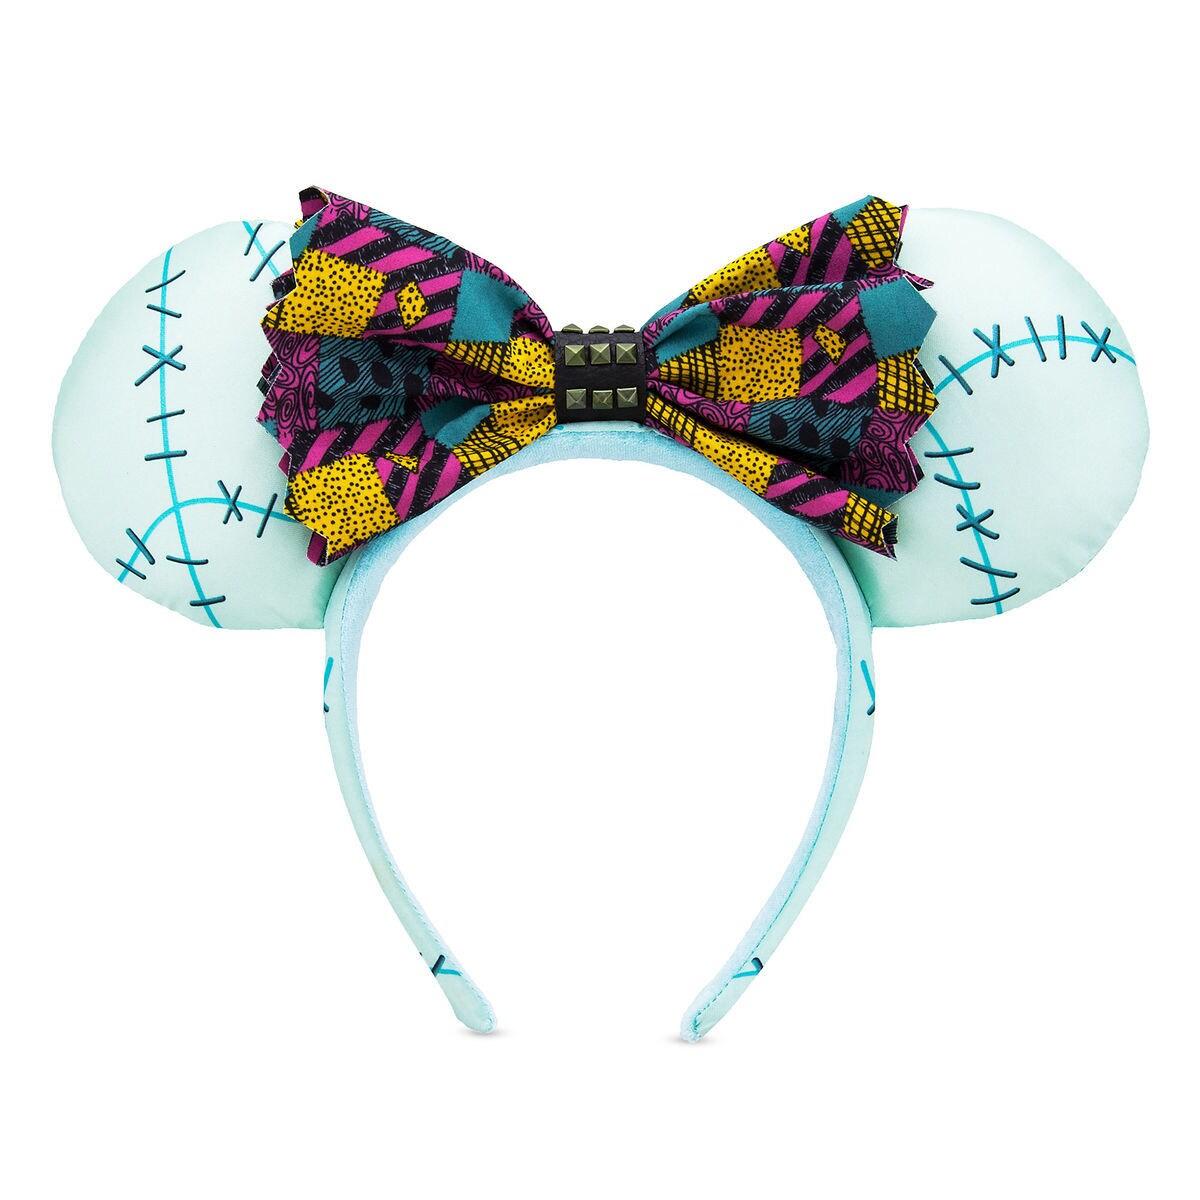 Sally Ears Headband For Adults Shopdisney